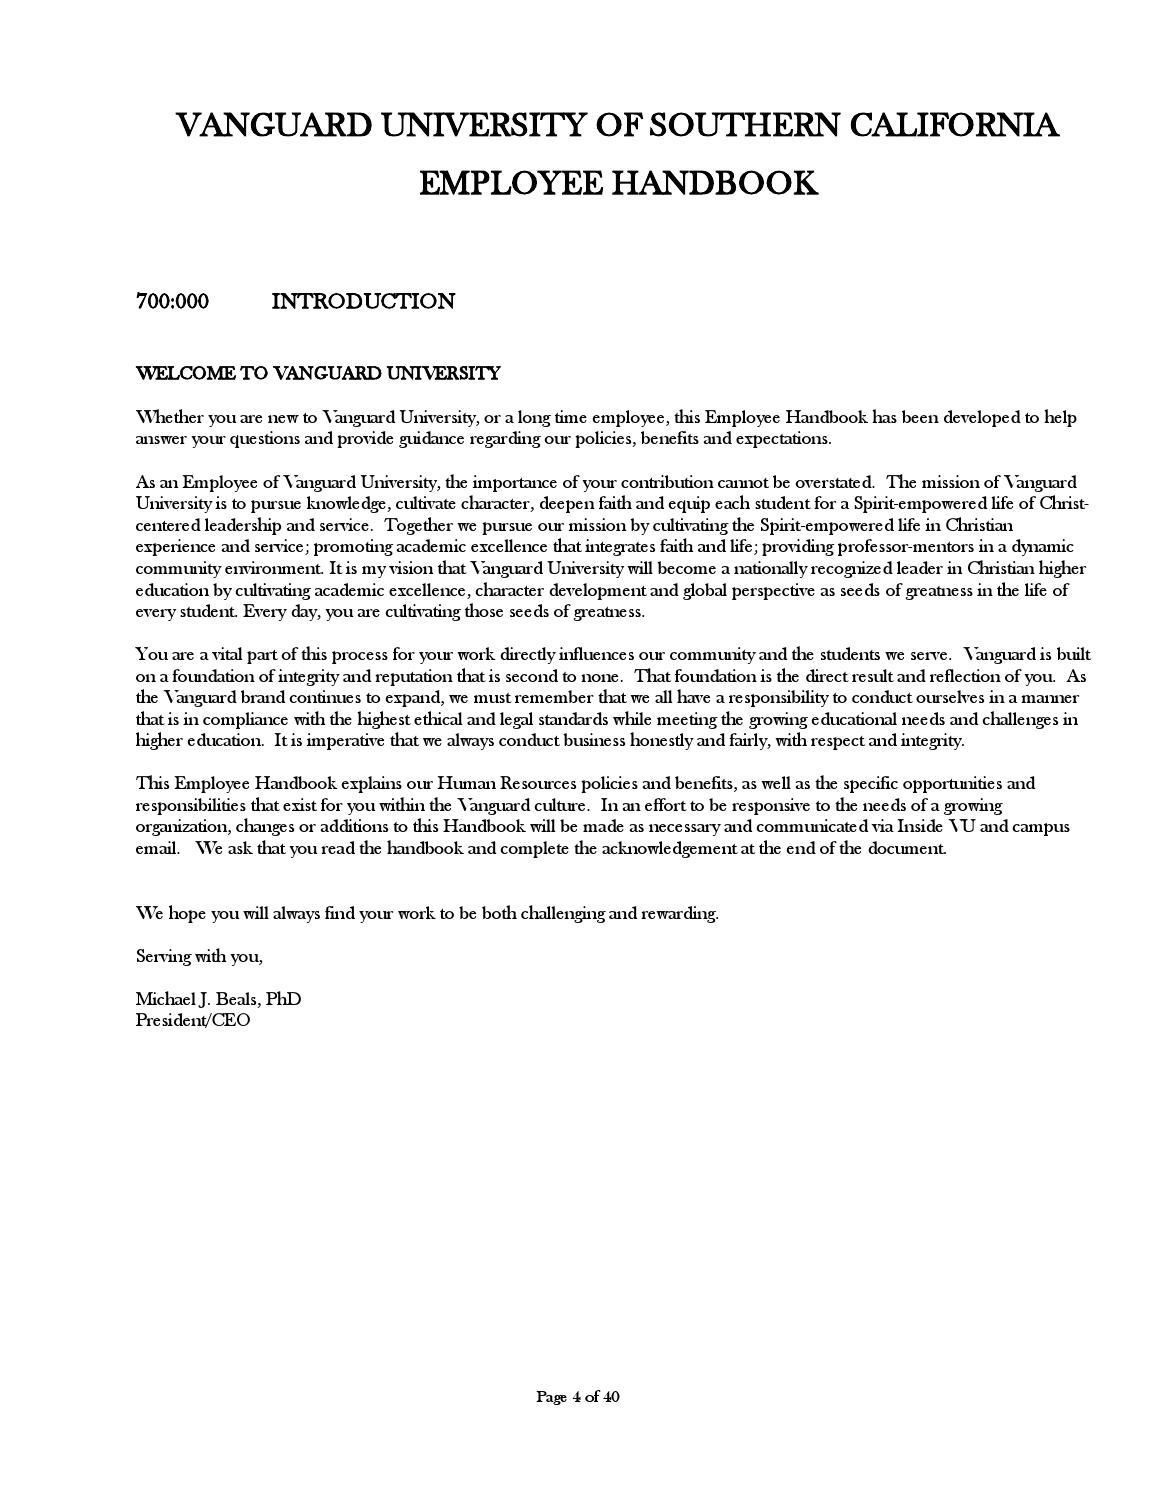 Vanguard employee handbook (2016 0330)v2 final by Vanguard